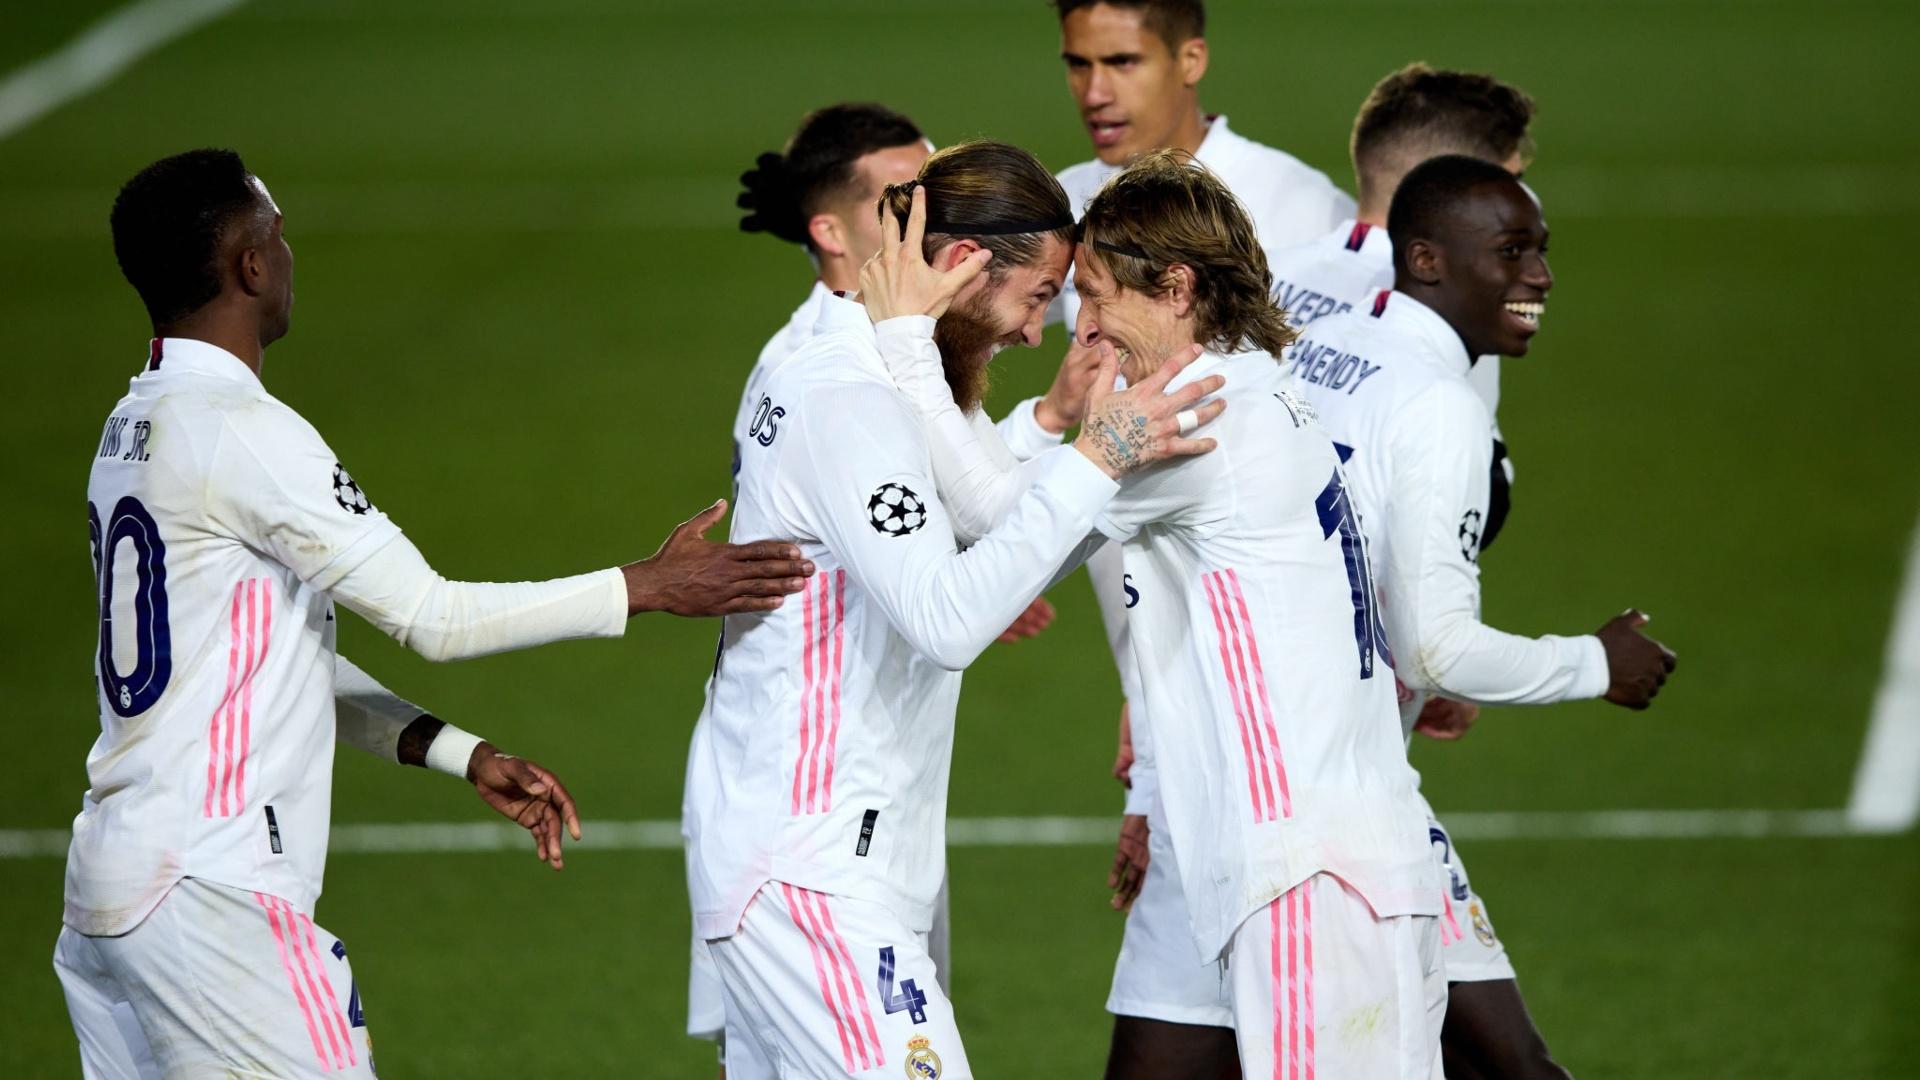 Match Report: Real Madrid 3-1 Atalanta B.C.